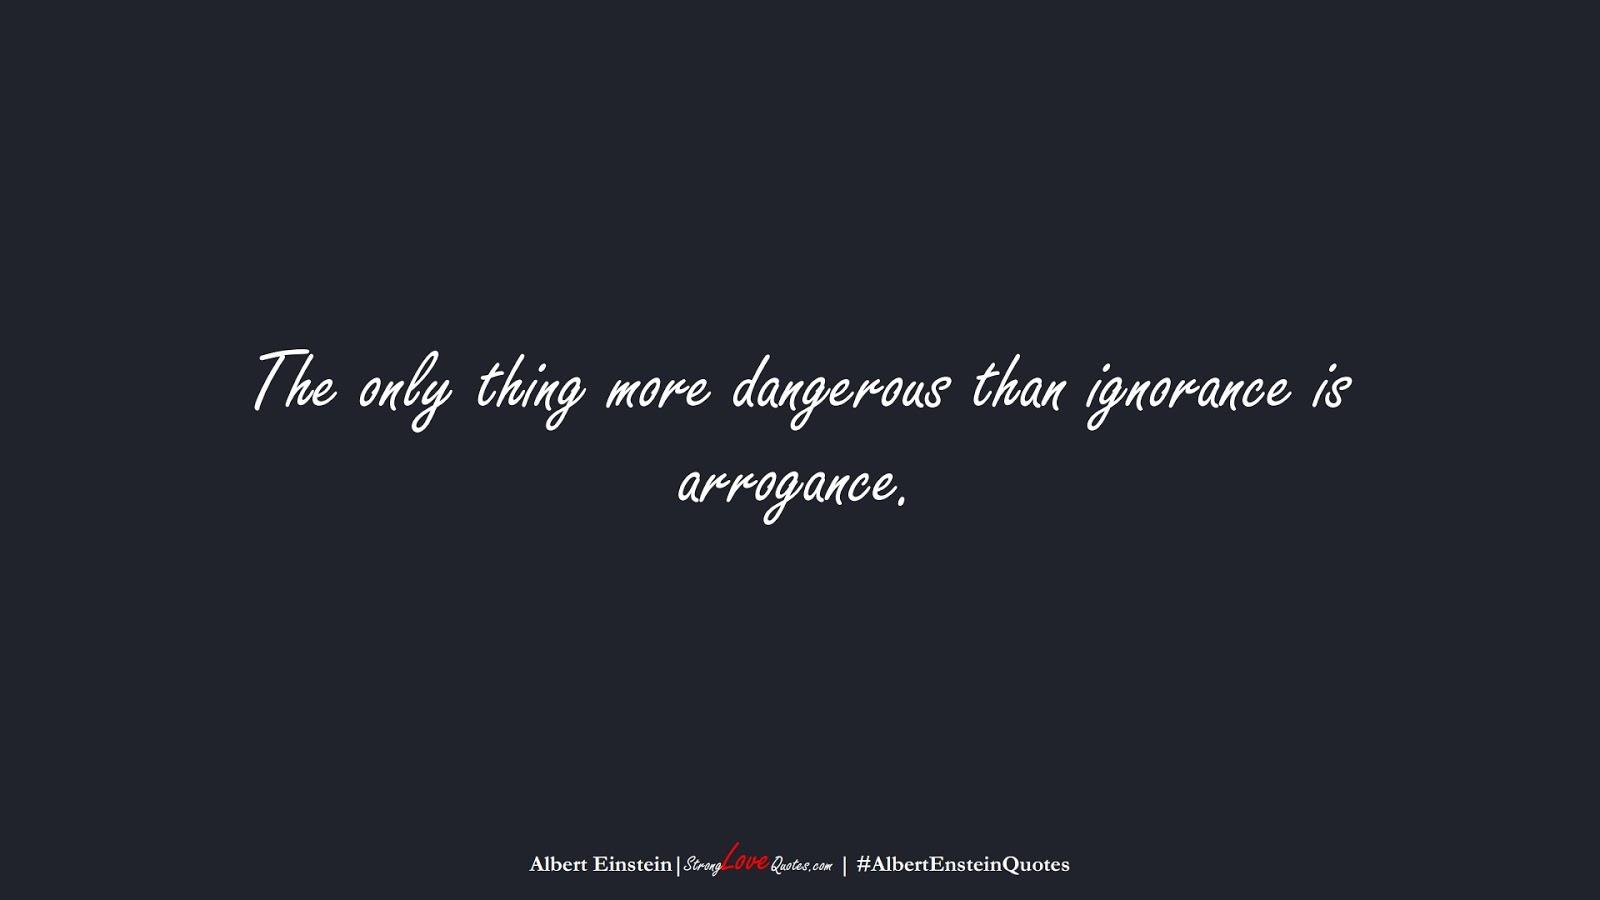 The only thing more dangerous than ignorance is arrogance. (Albert Einstein);  #AlbertEnsteinQuotes